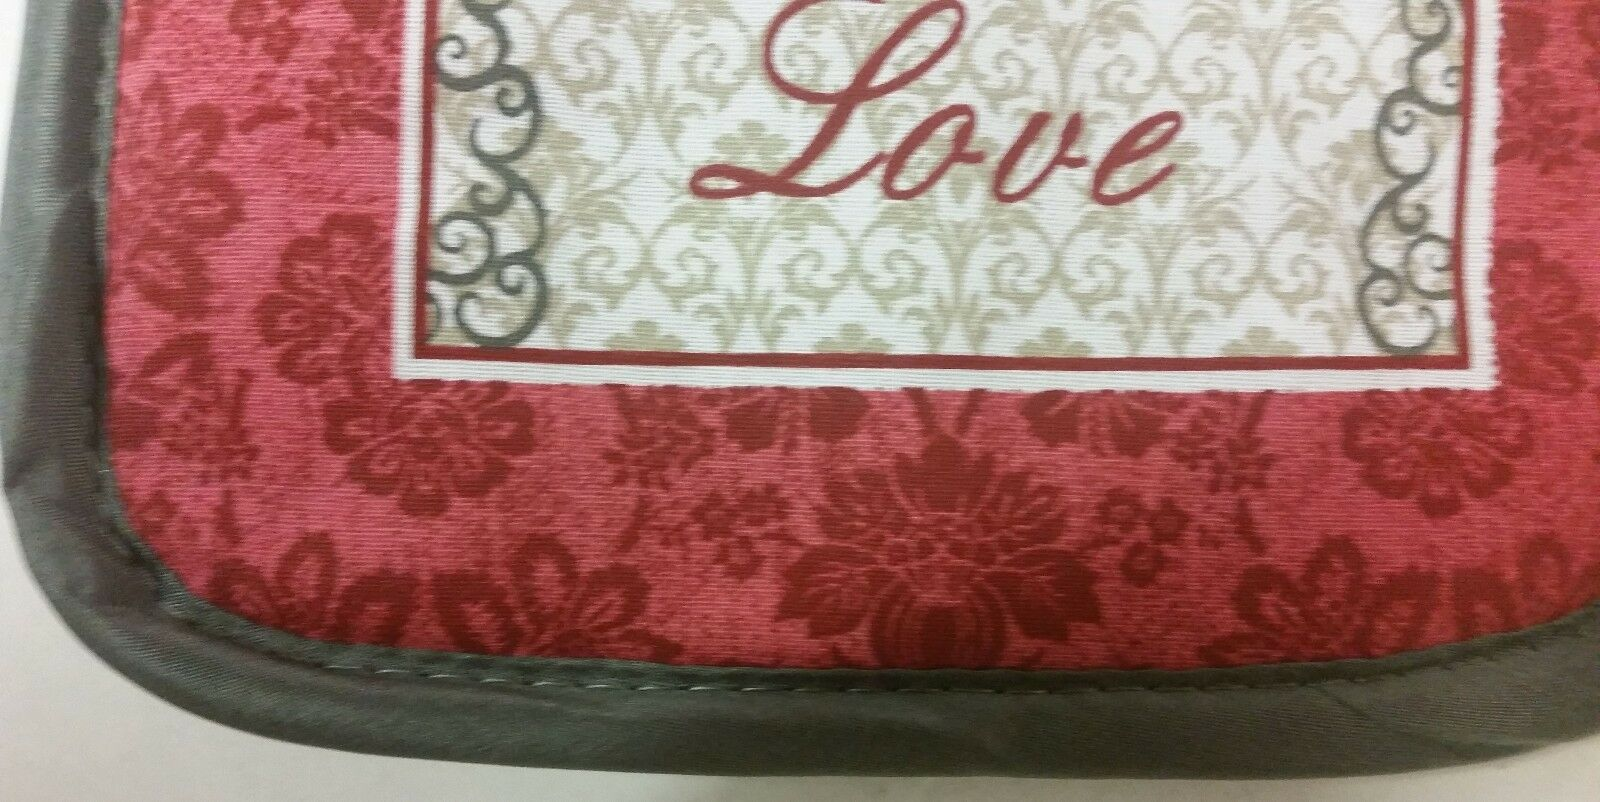 "2 Same Printed Kitchen Pot Holders (7""x 7'), FAMILY FAITH LOVE"